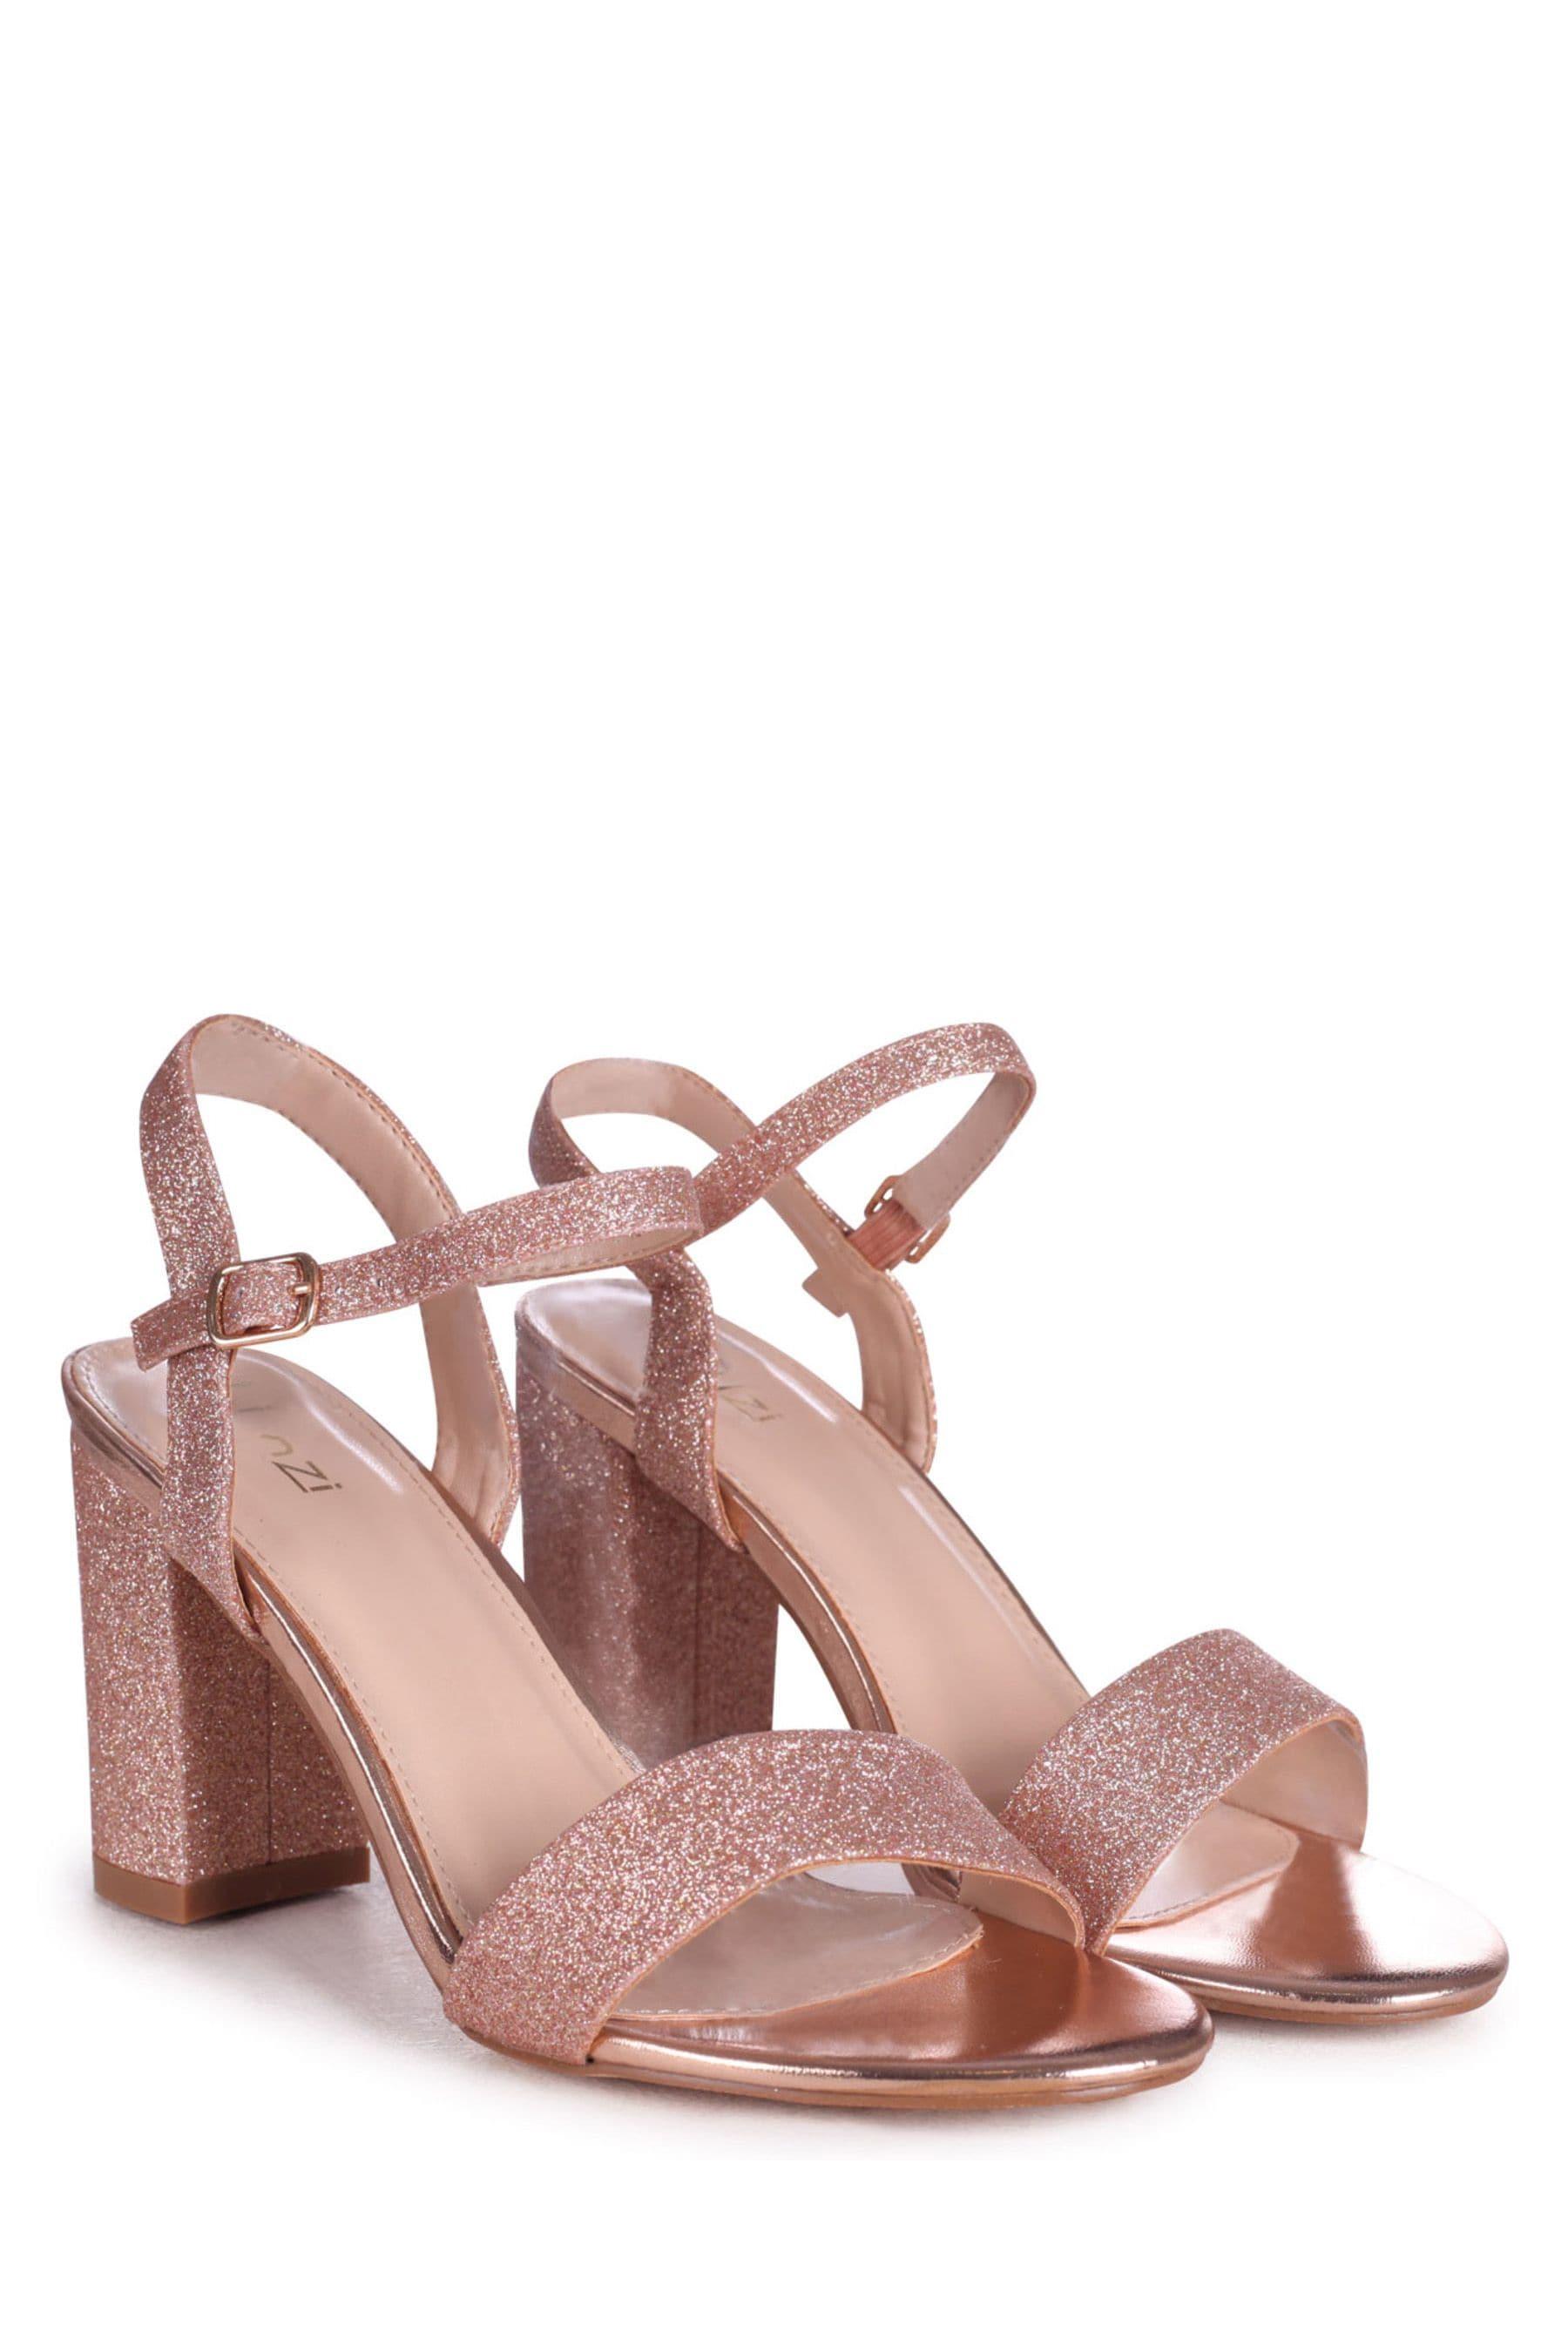 Linzi Ladies MONIQUE Barely There Block Heeled Sandal